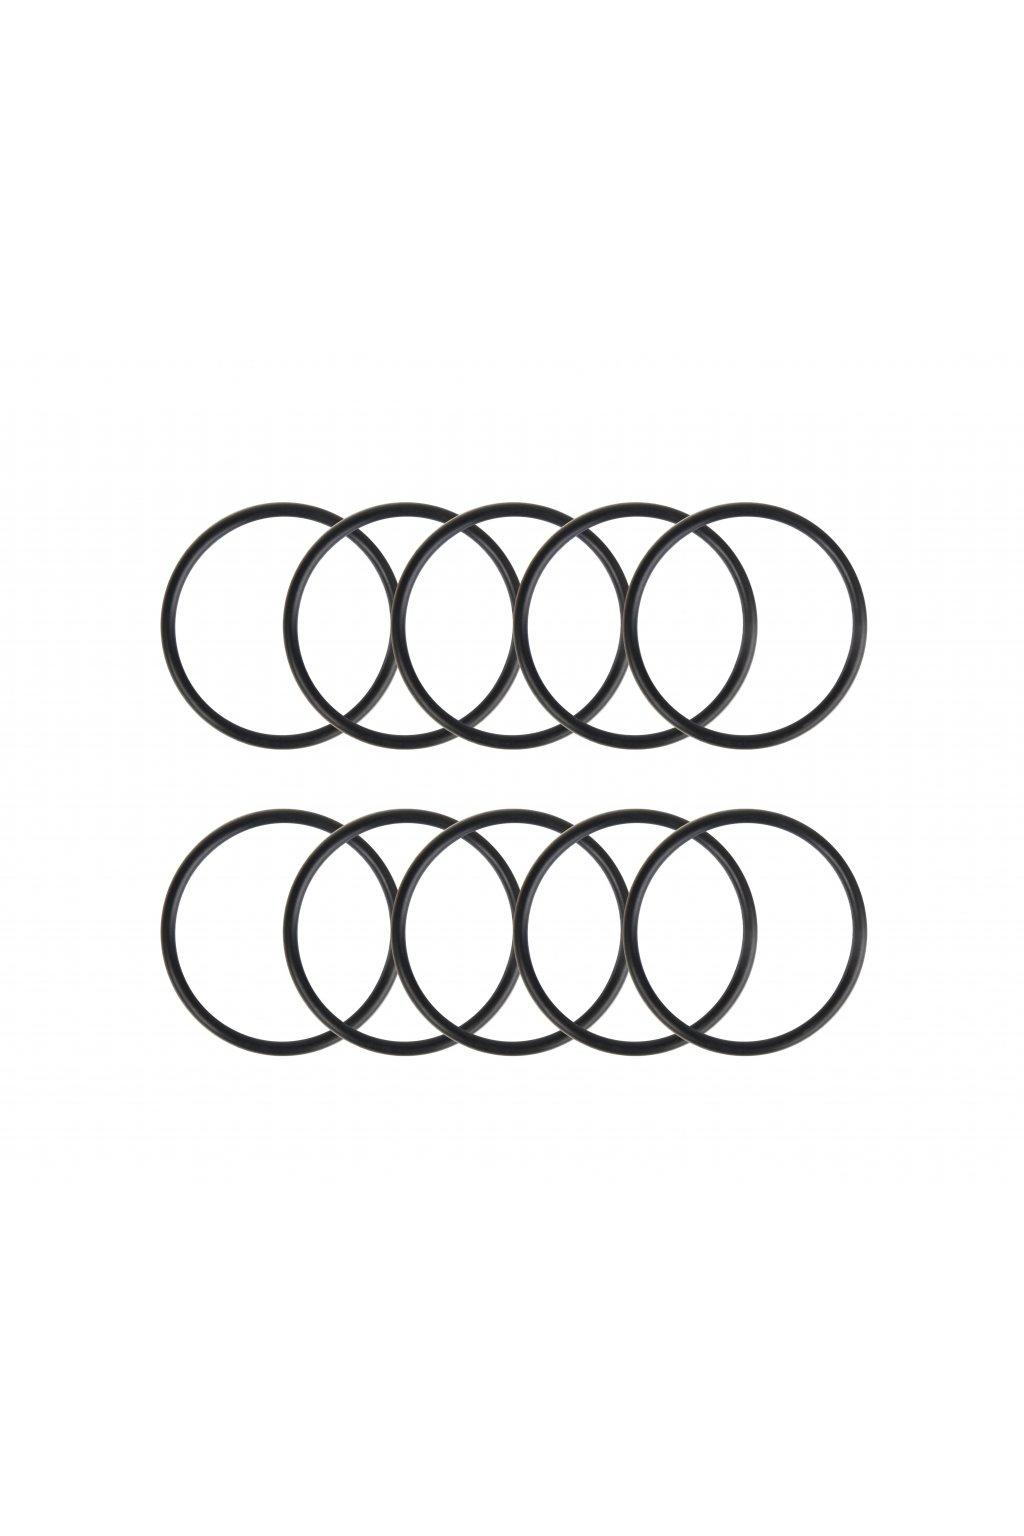 CA Quickraw o rings RGB